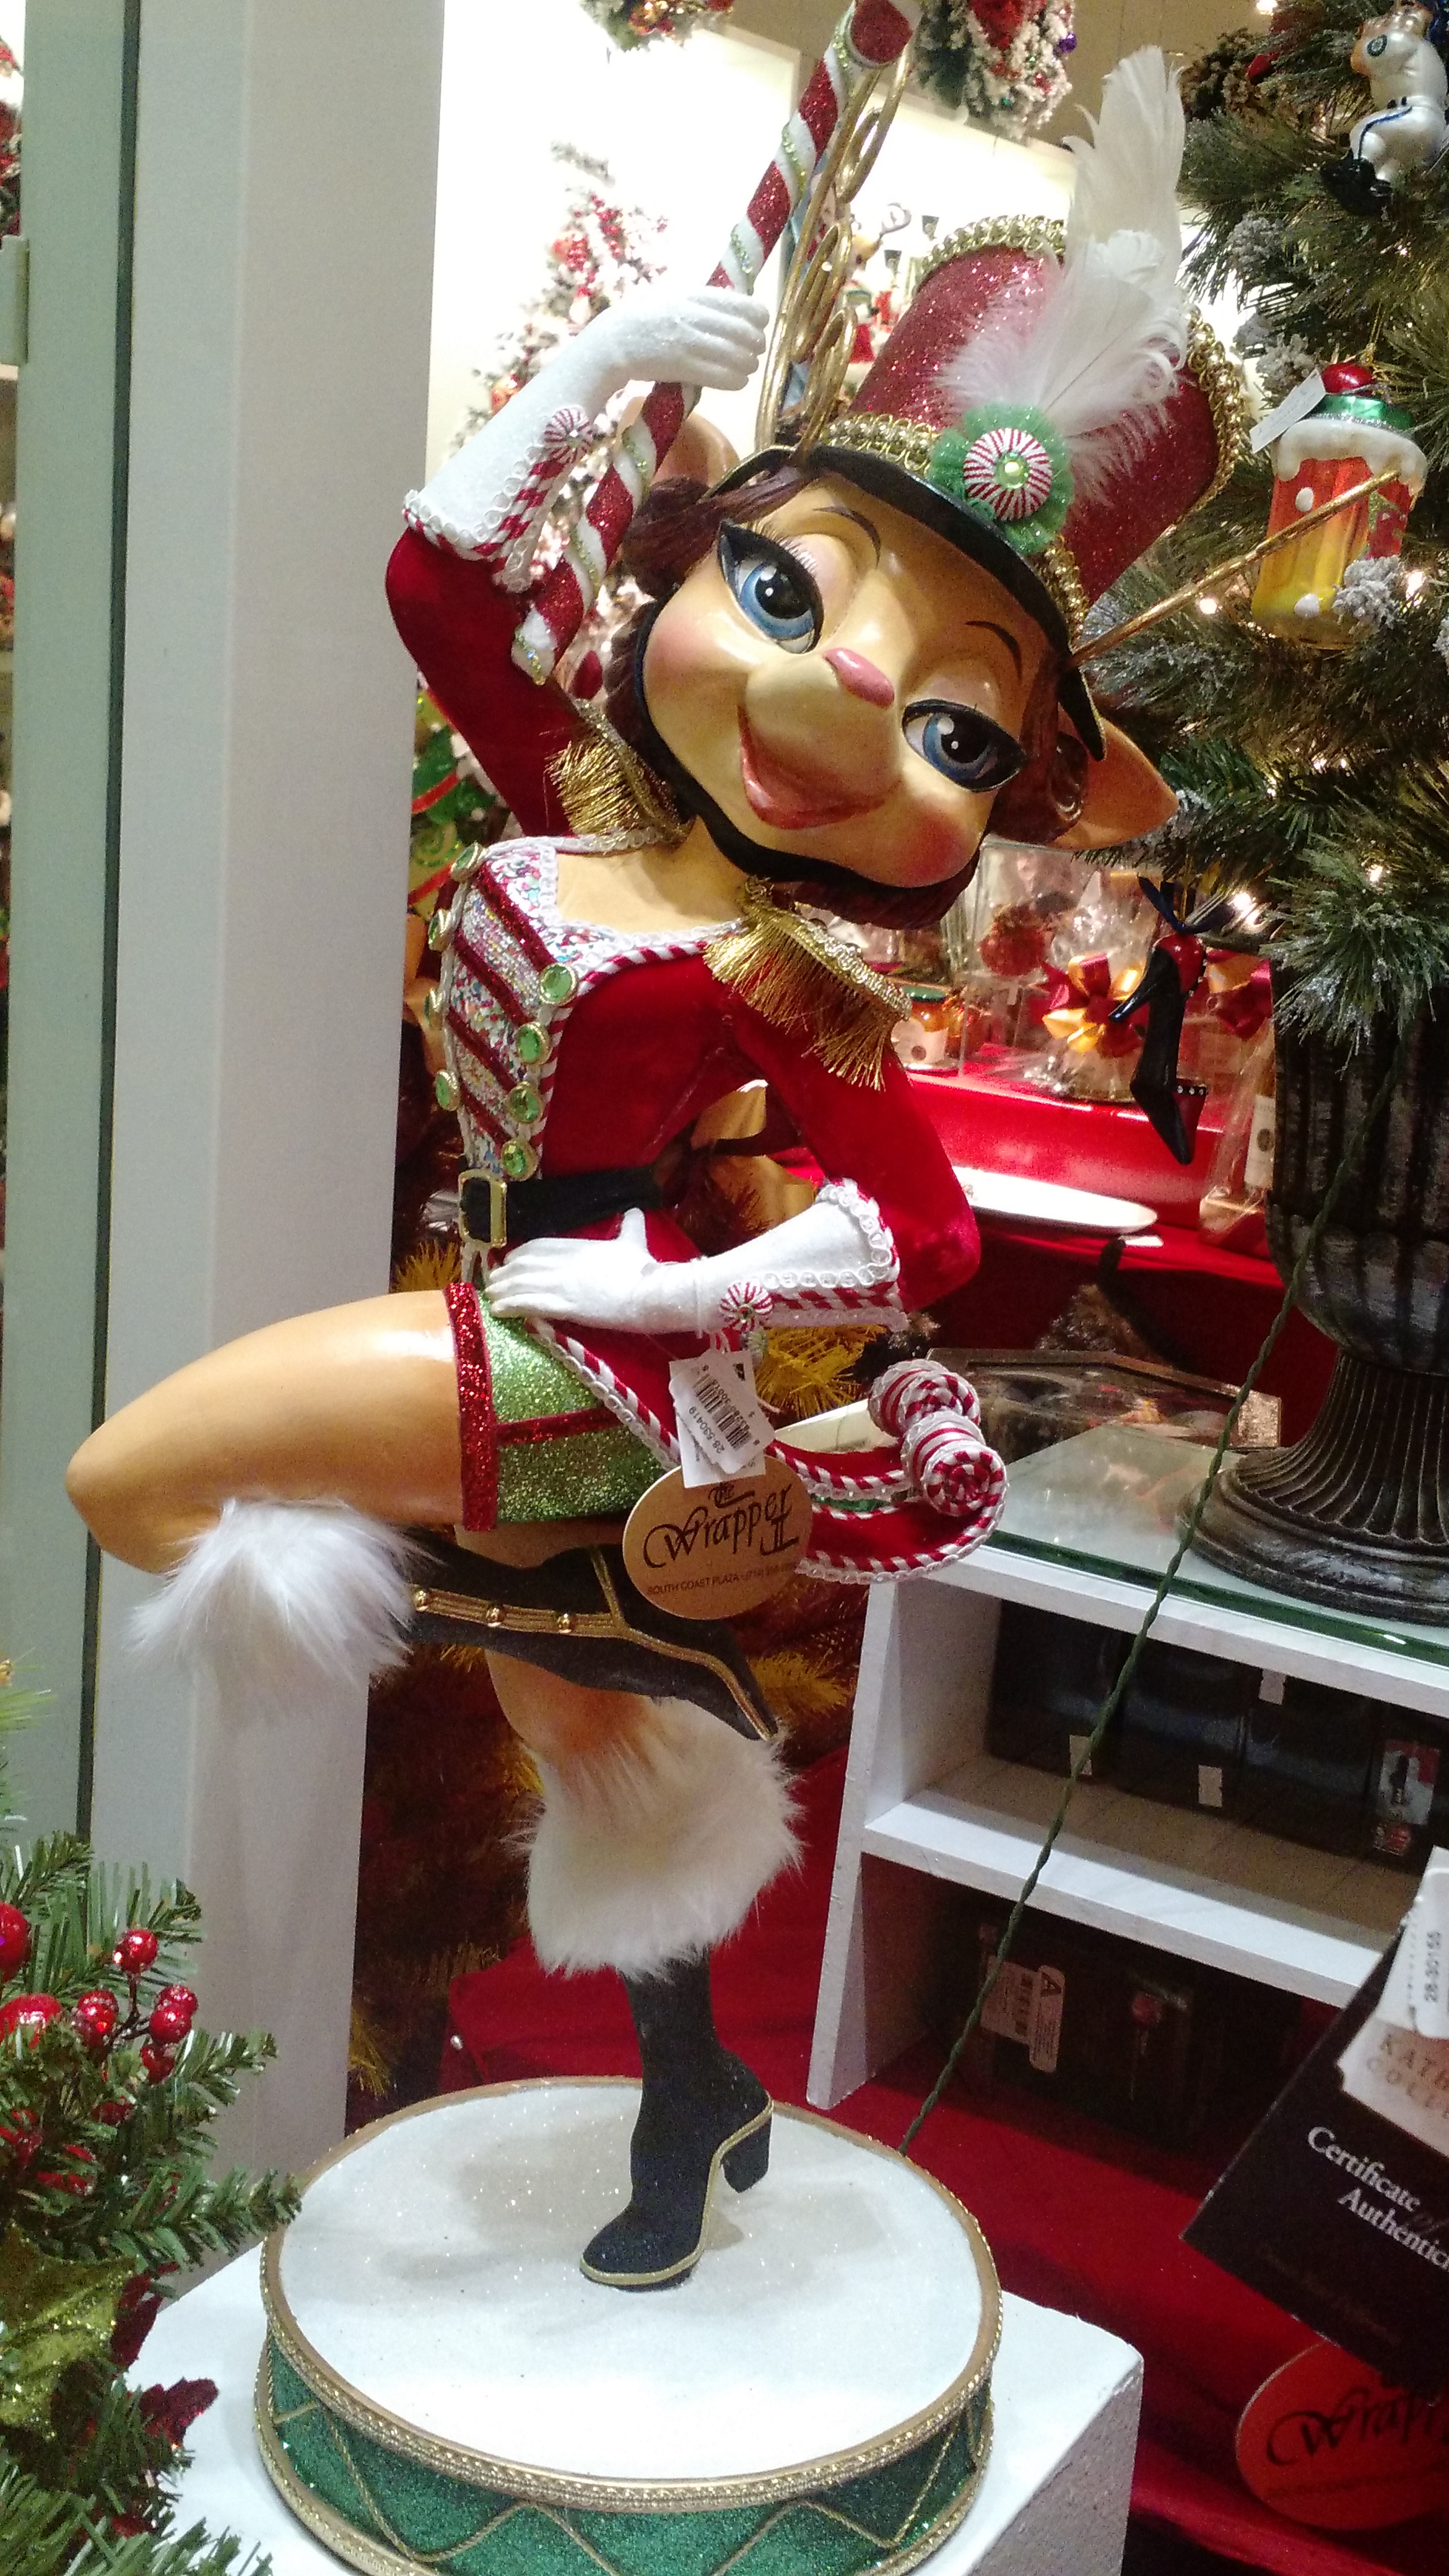 roa aut derpy hooves christmas christmas decoration - Christmas Furry